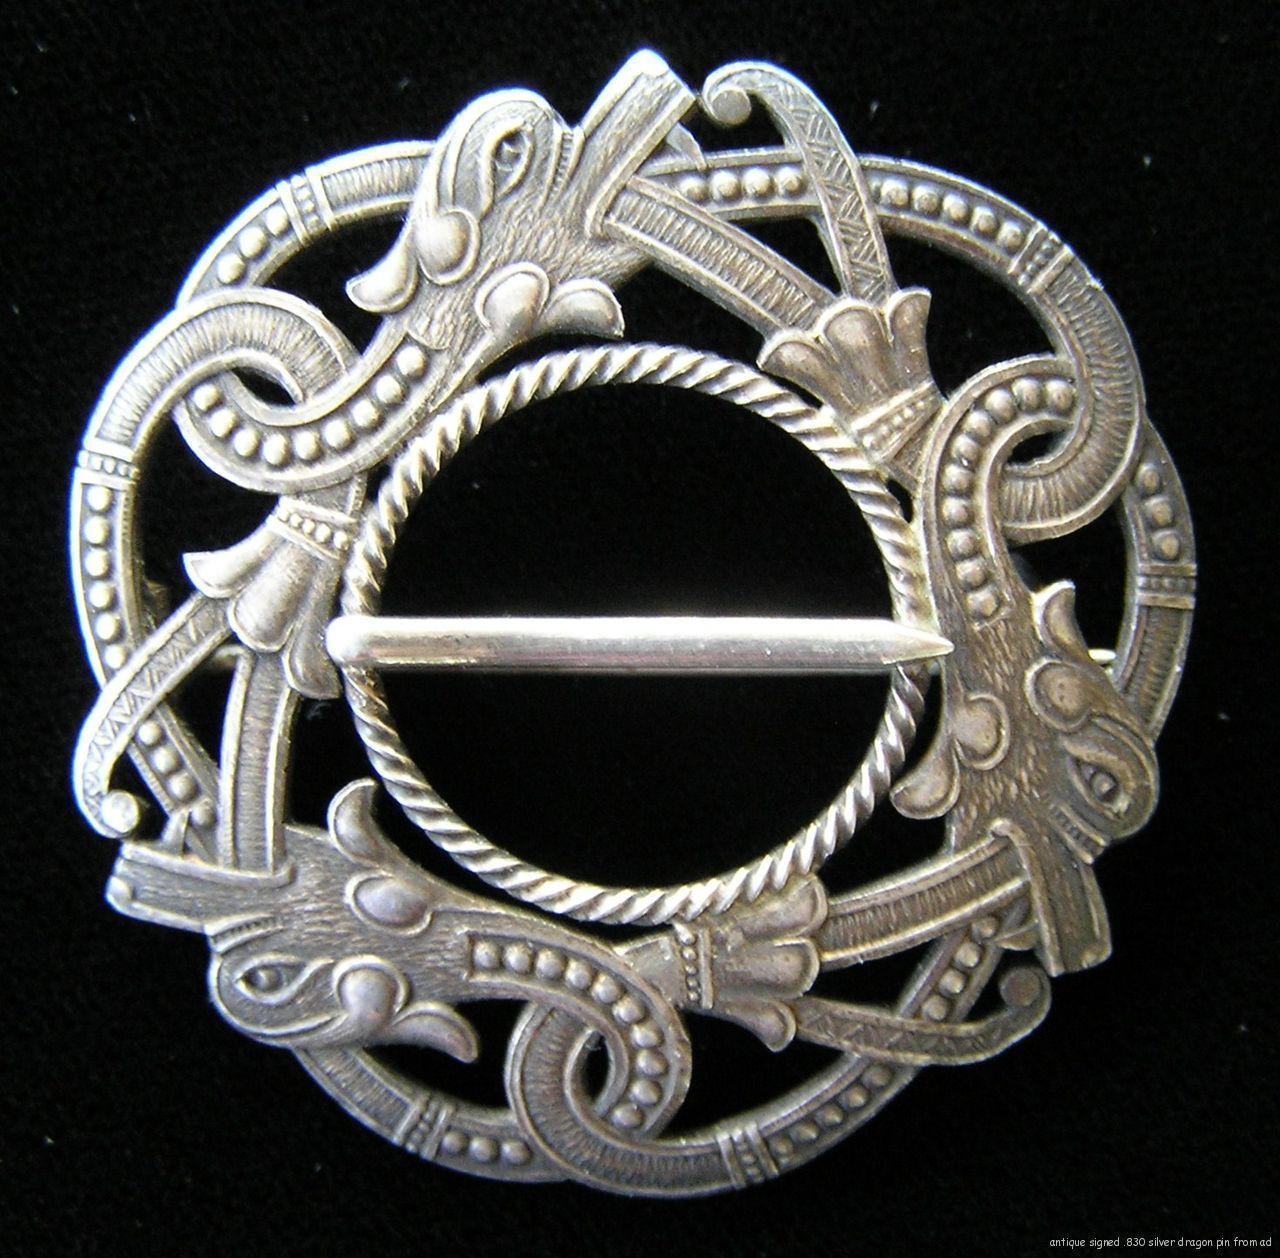 Antique Norwegian Norway Signed C Berg 830 Silver Solje Drage Dragon Pin Brooch Scandinavian Jewelry Viking Jewelry Norwegian Jewelry